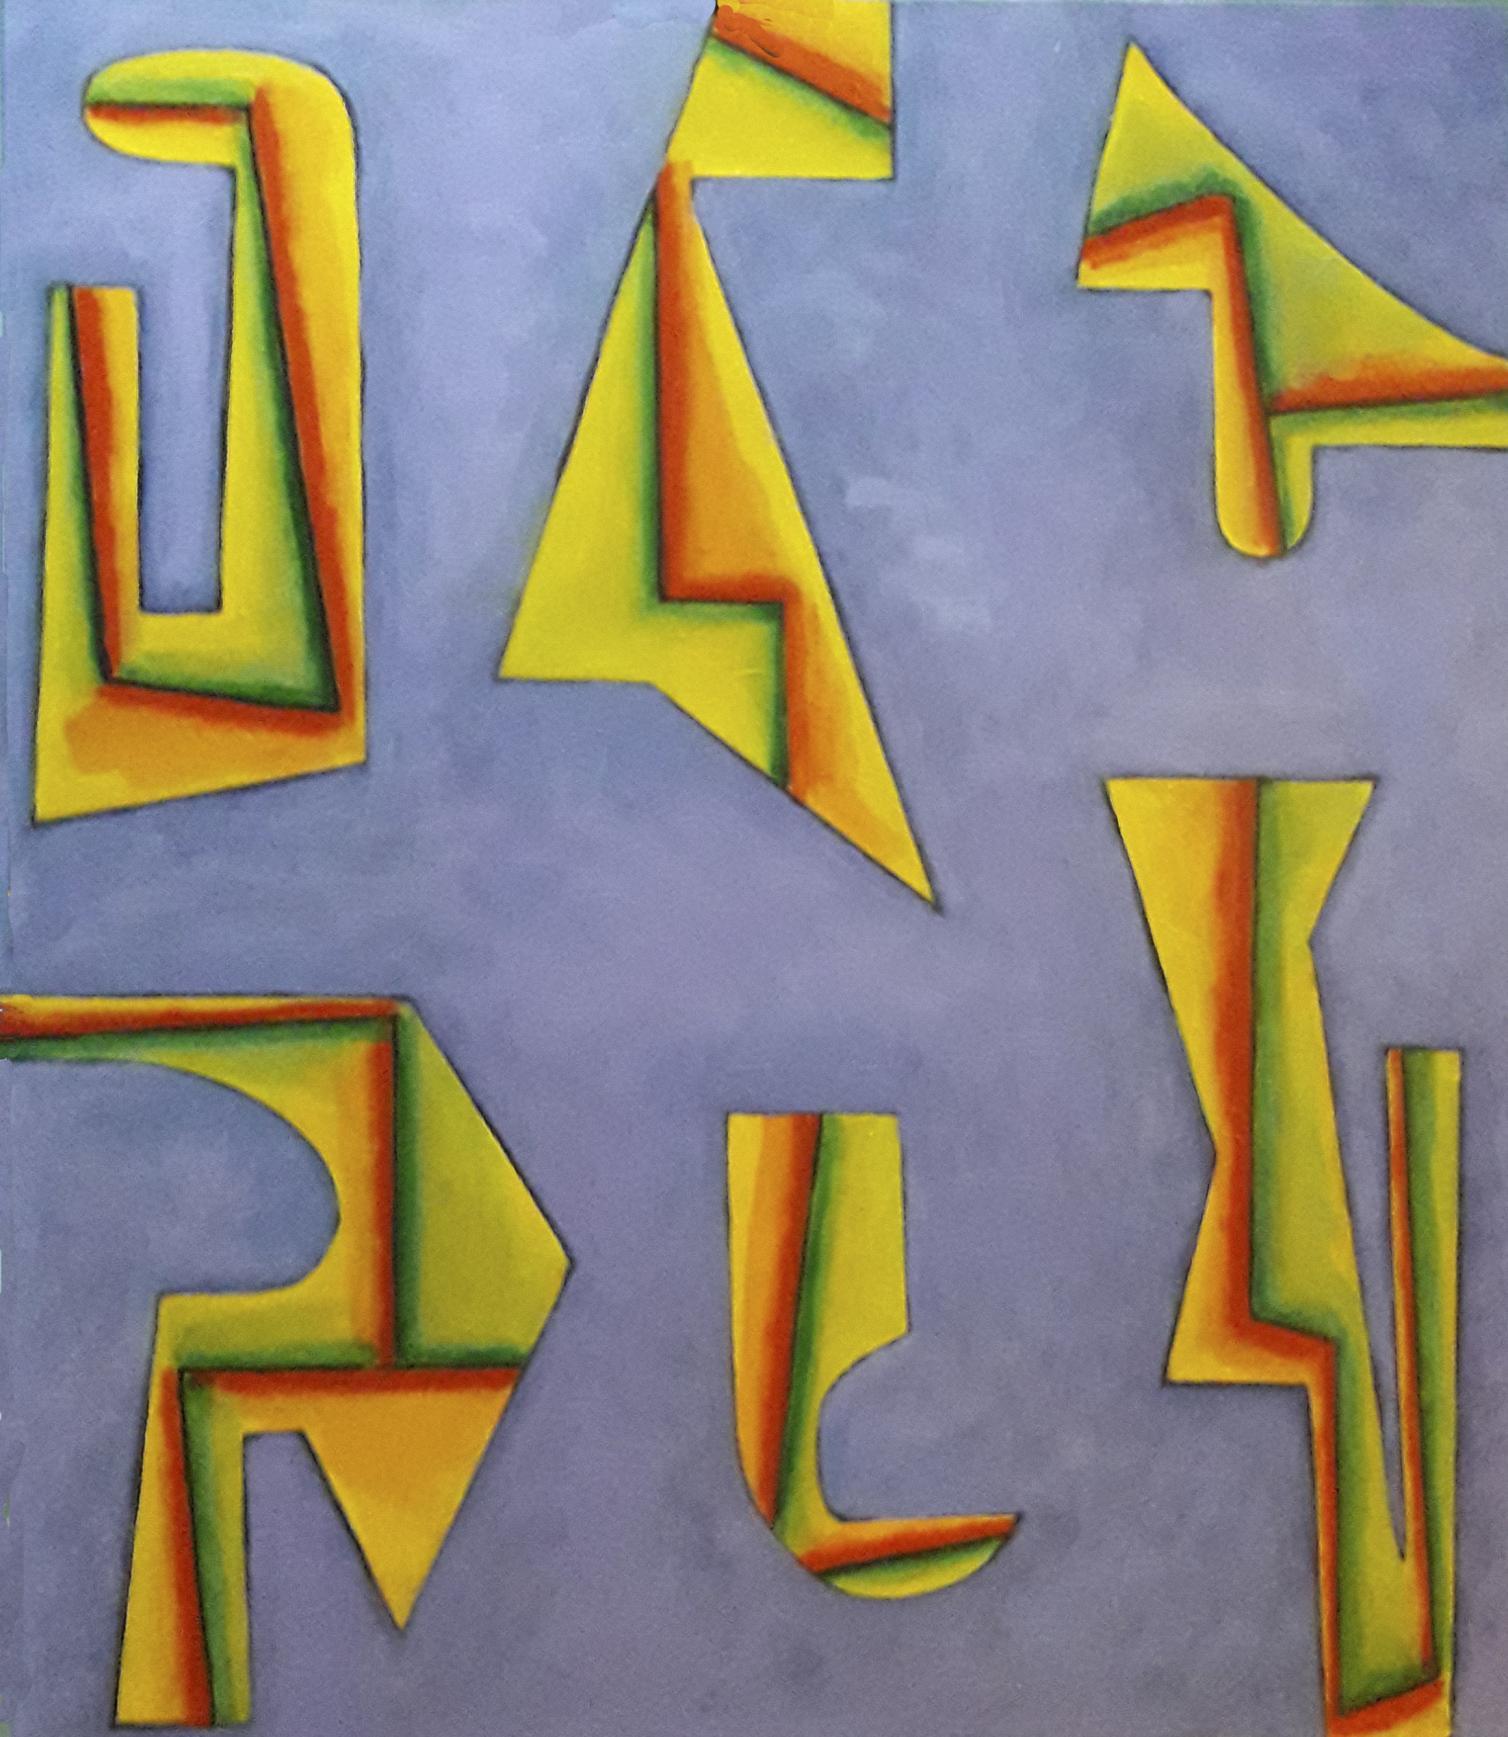 PARALELAS, Acrílico sobre tela 100x100 cm. (2020) - Daniel Jorge Castro Cuccuini